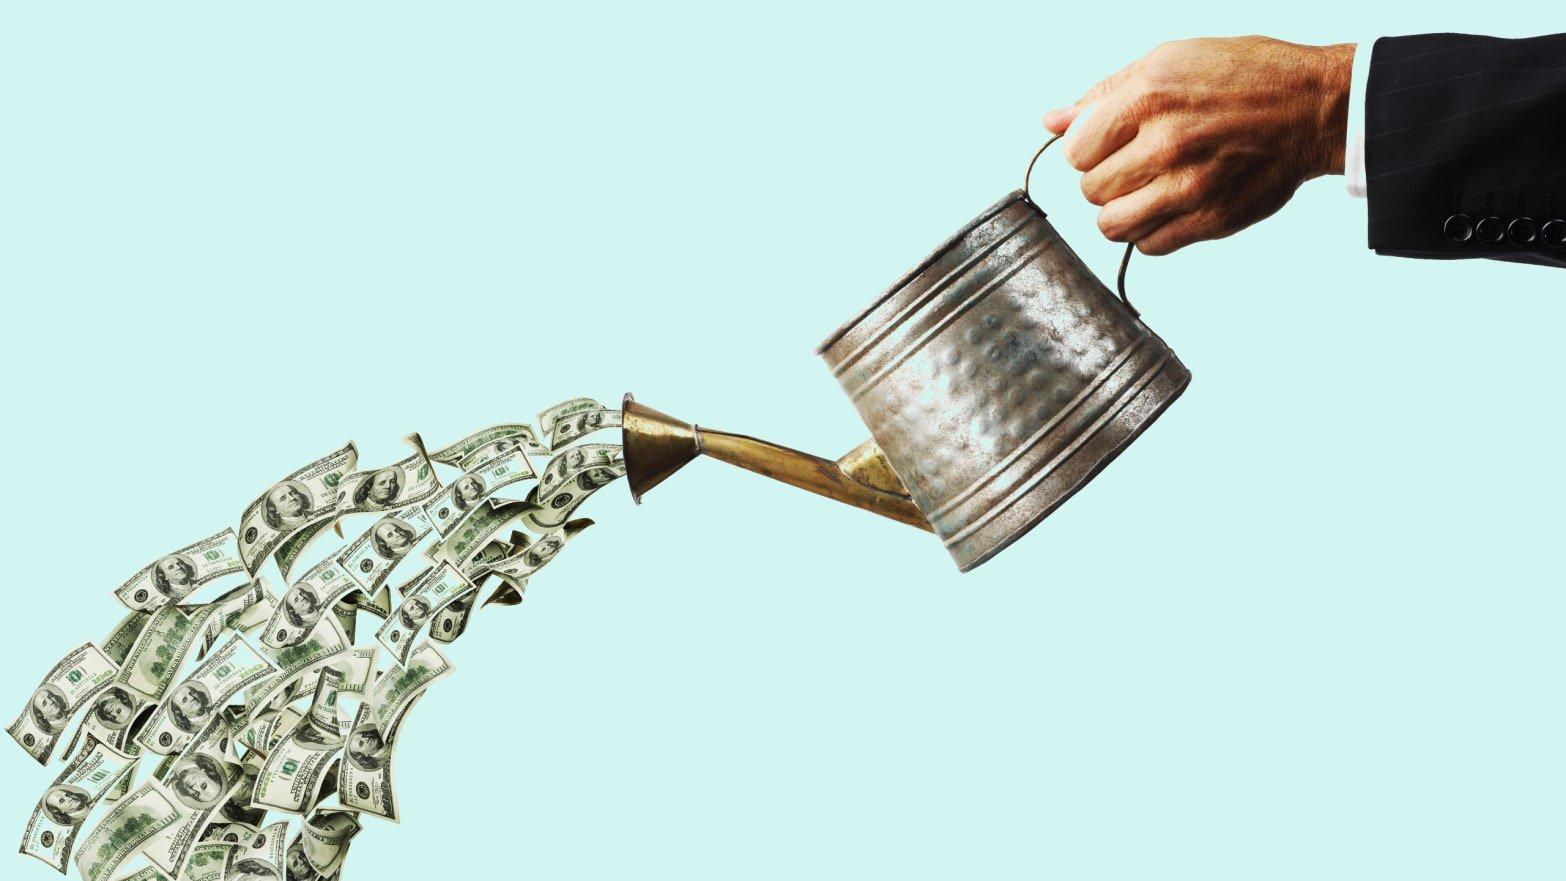 telecom providers pour billions into lobbying congress